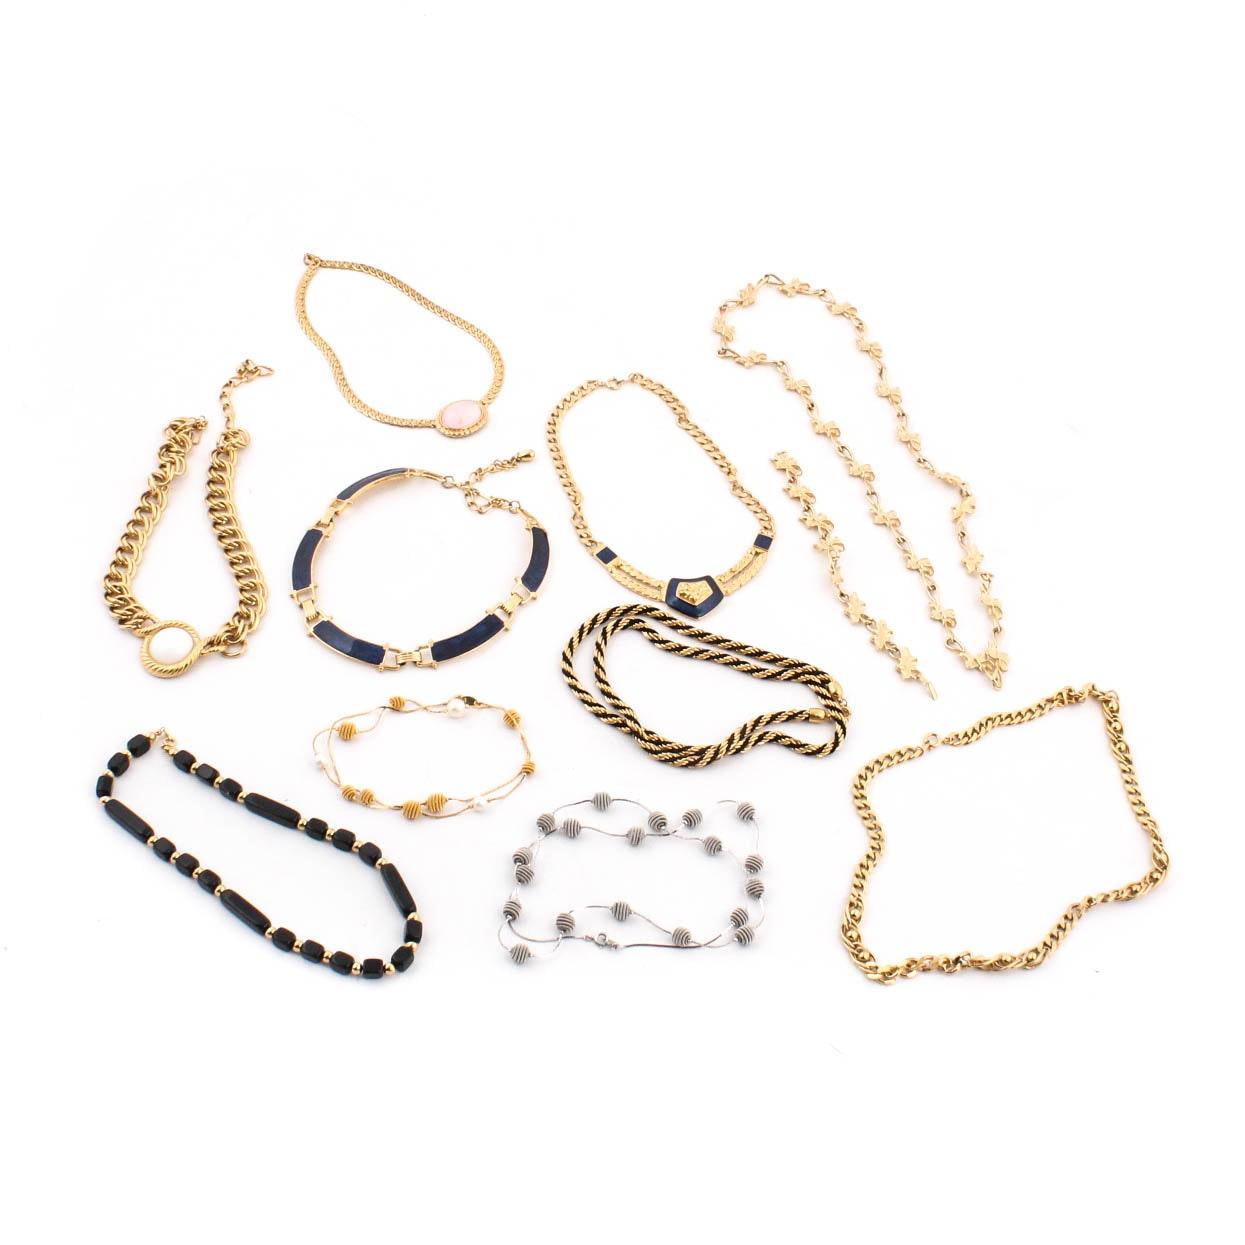 Trifari Jewelry Collection